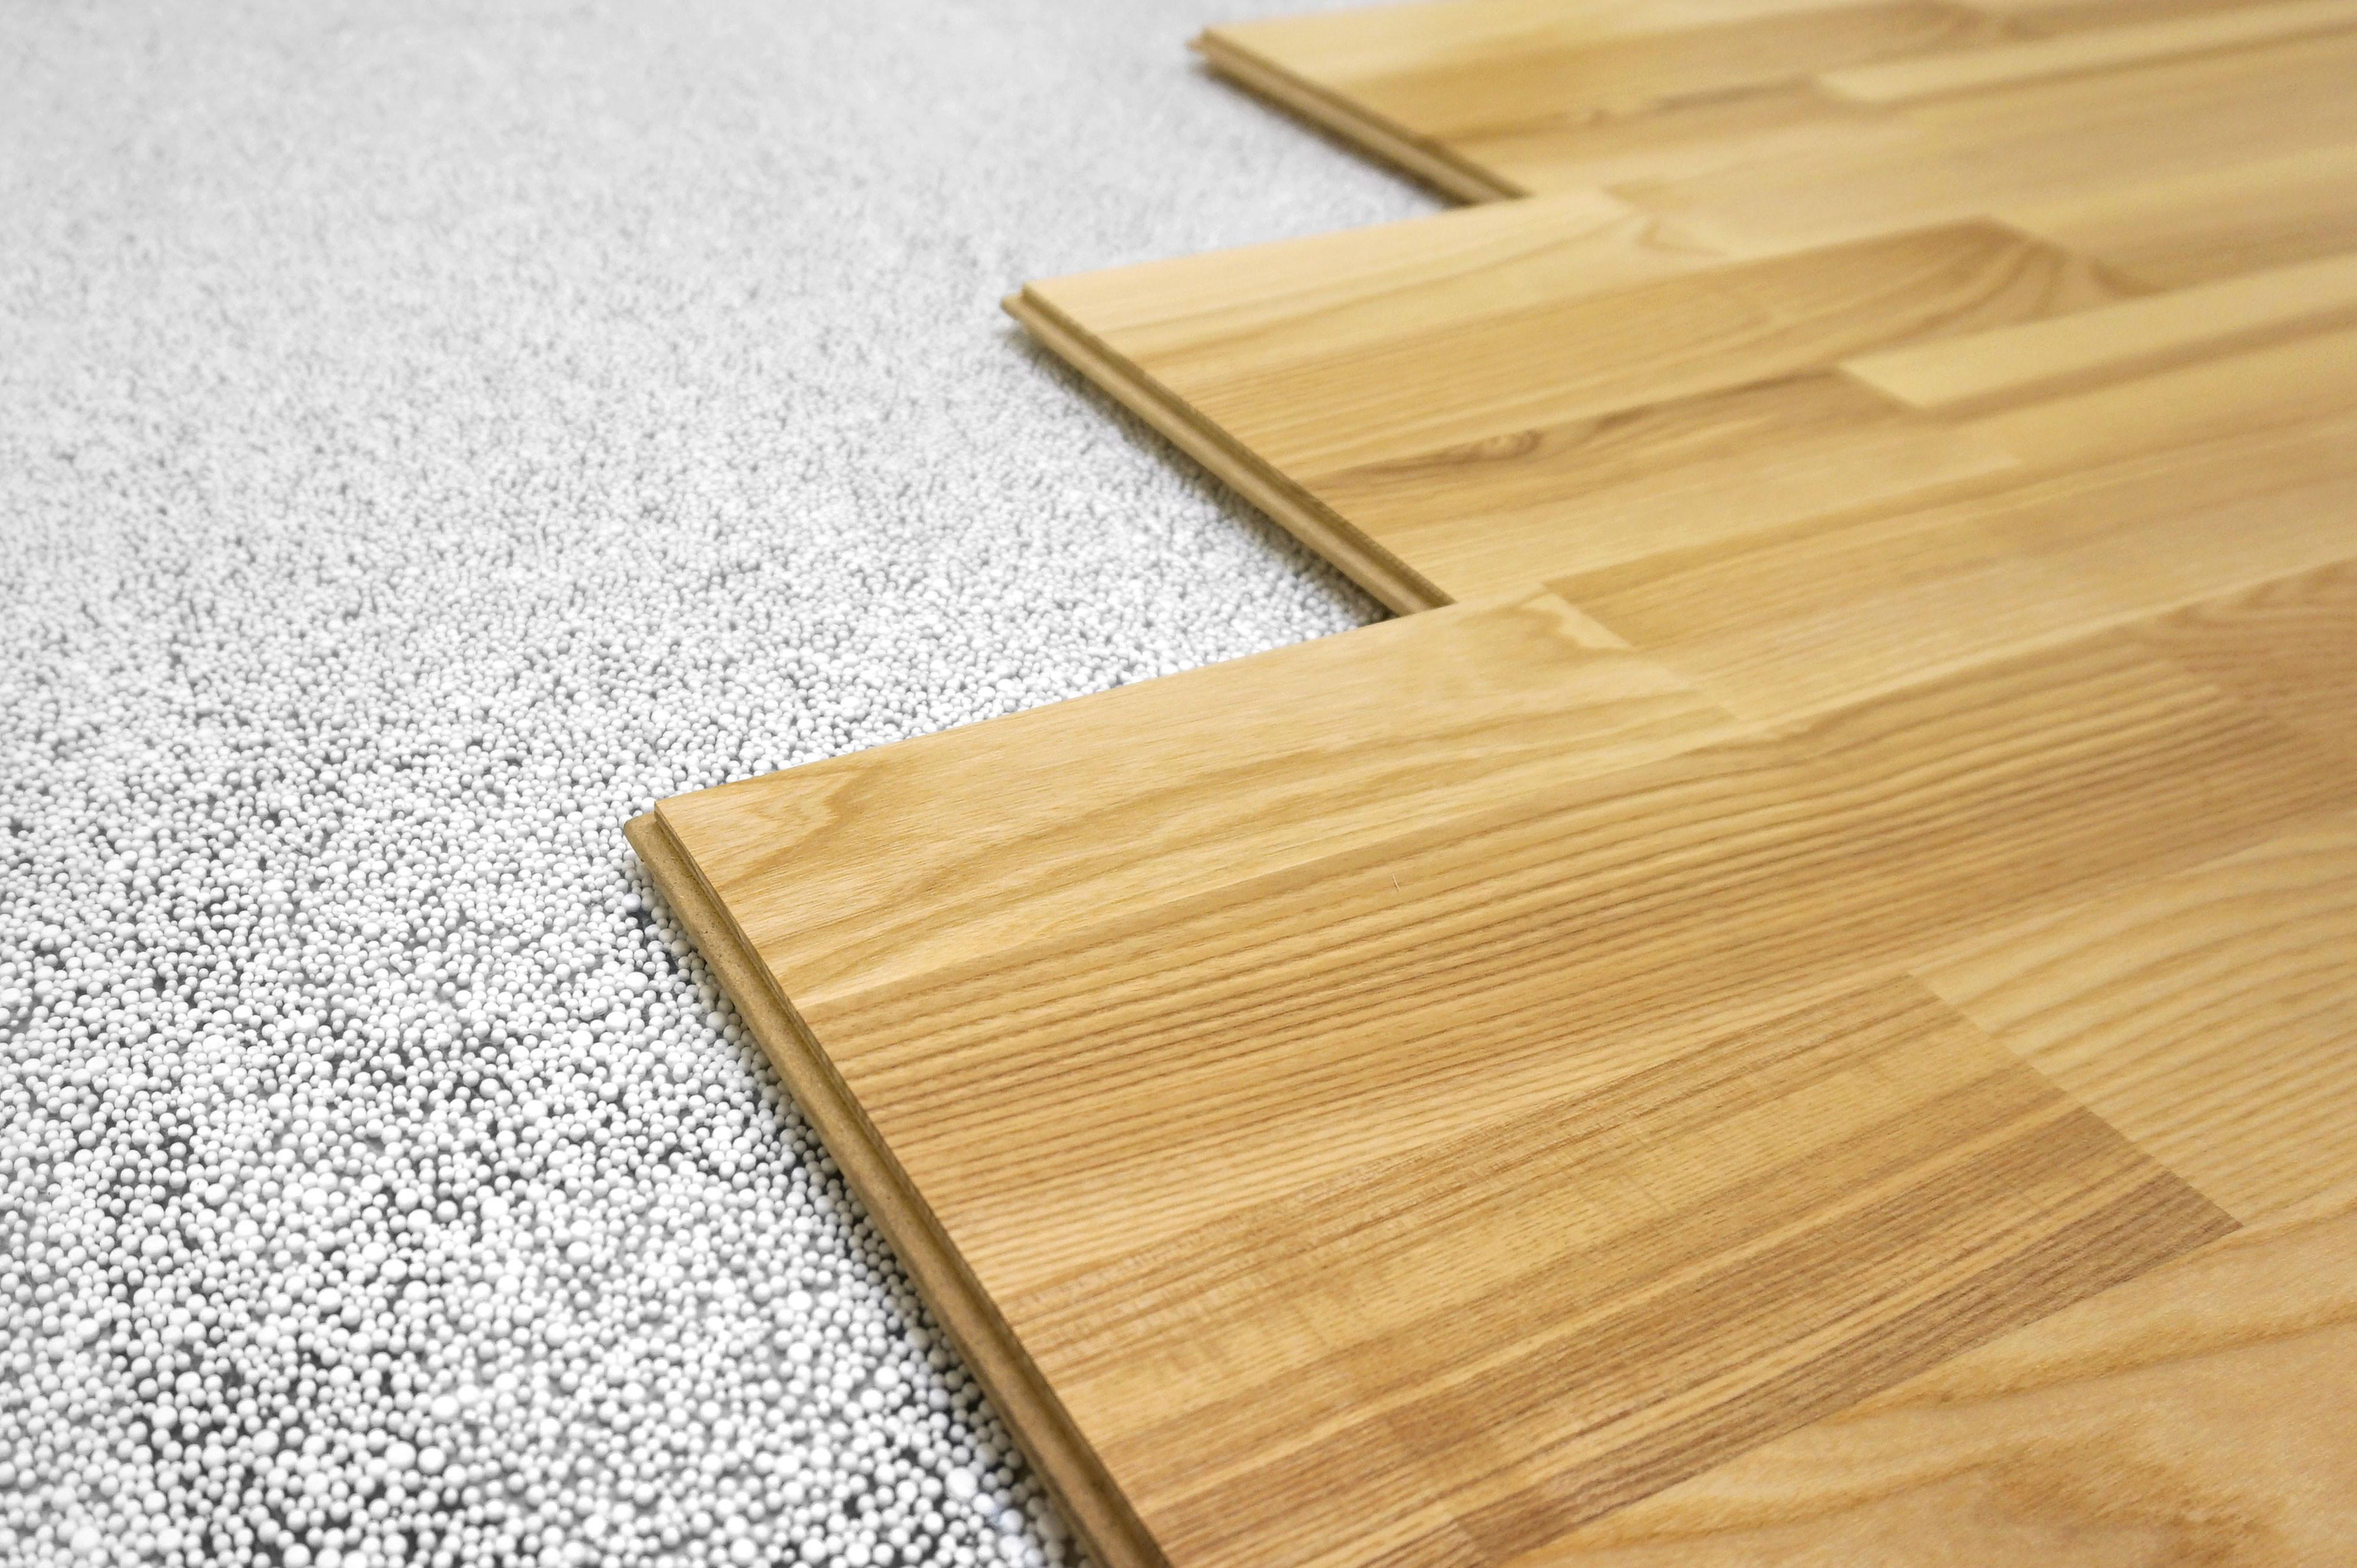 15 Trendy Hardwood Flooring Houston Tx 2021 free download hardwood flooring houston tx of what does it cost to install laminate flooring angies list with regard to wood lam